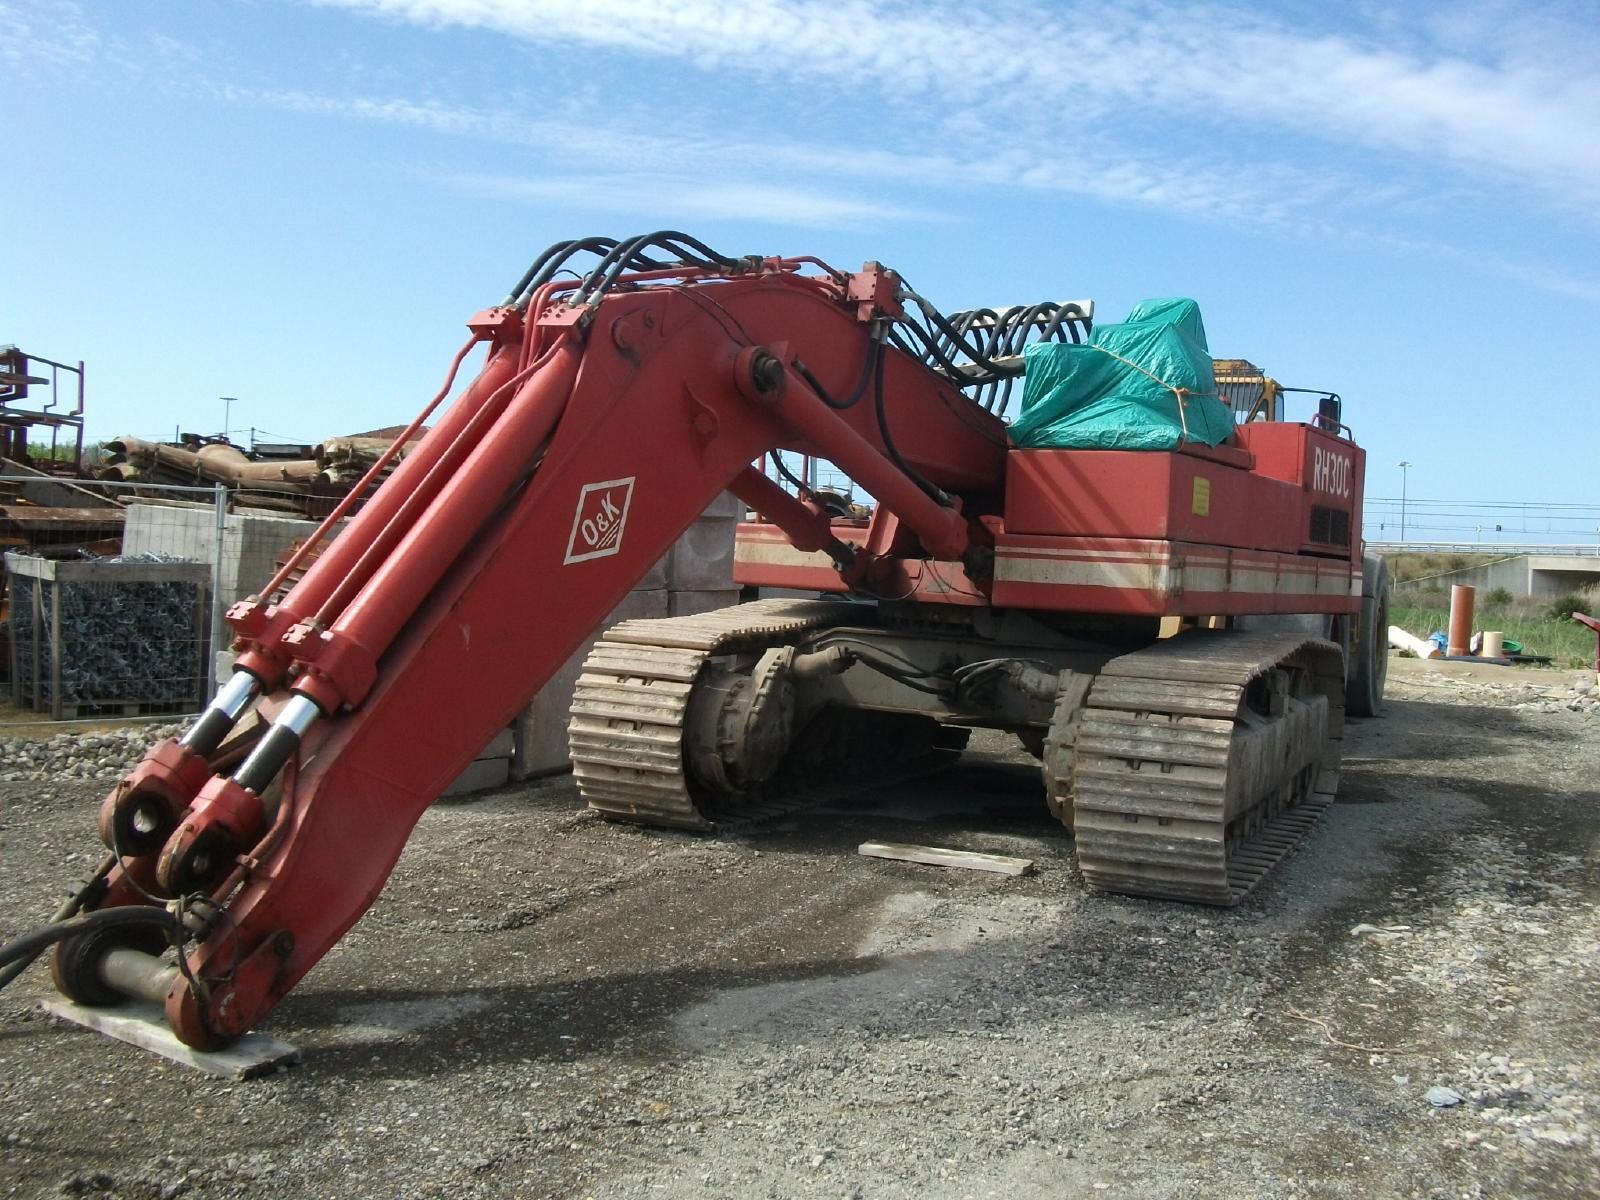 Tracked excavator - Other rh 30c